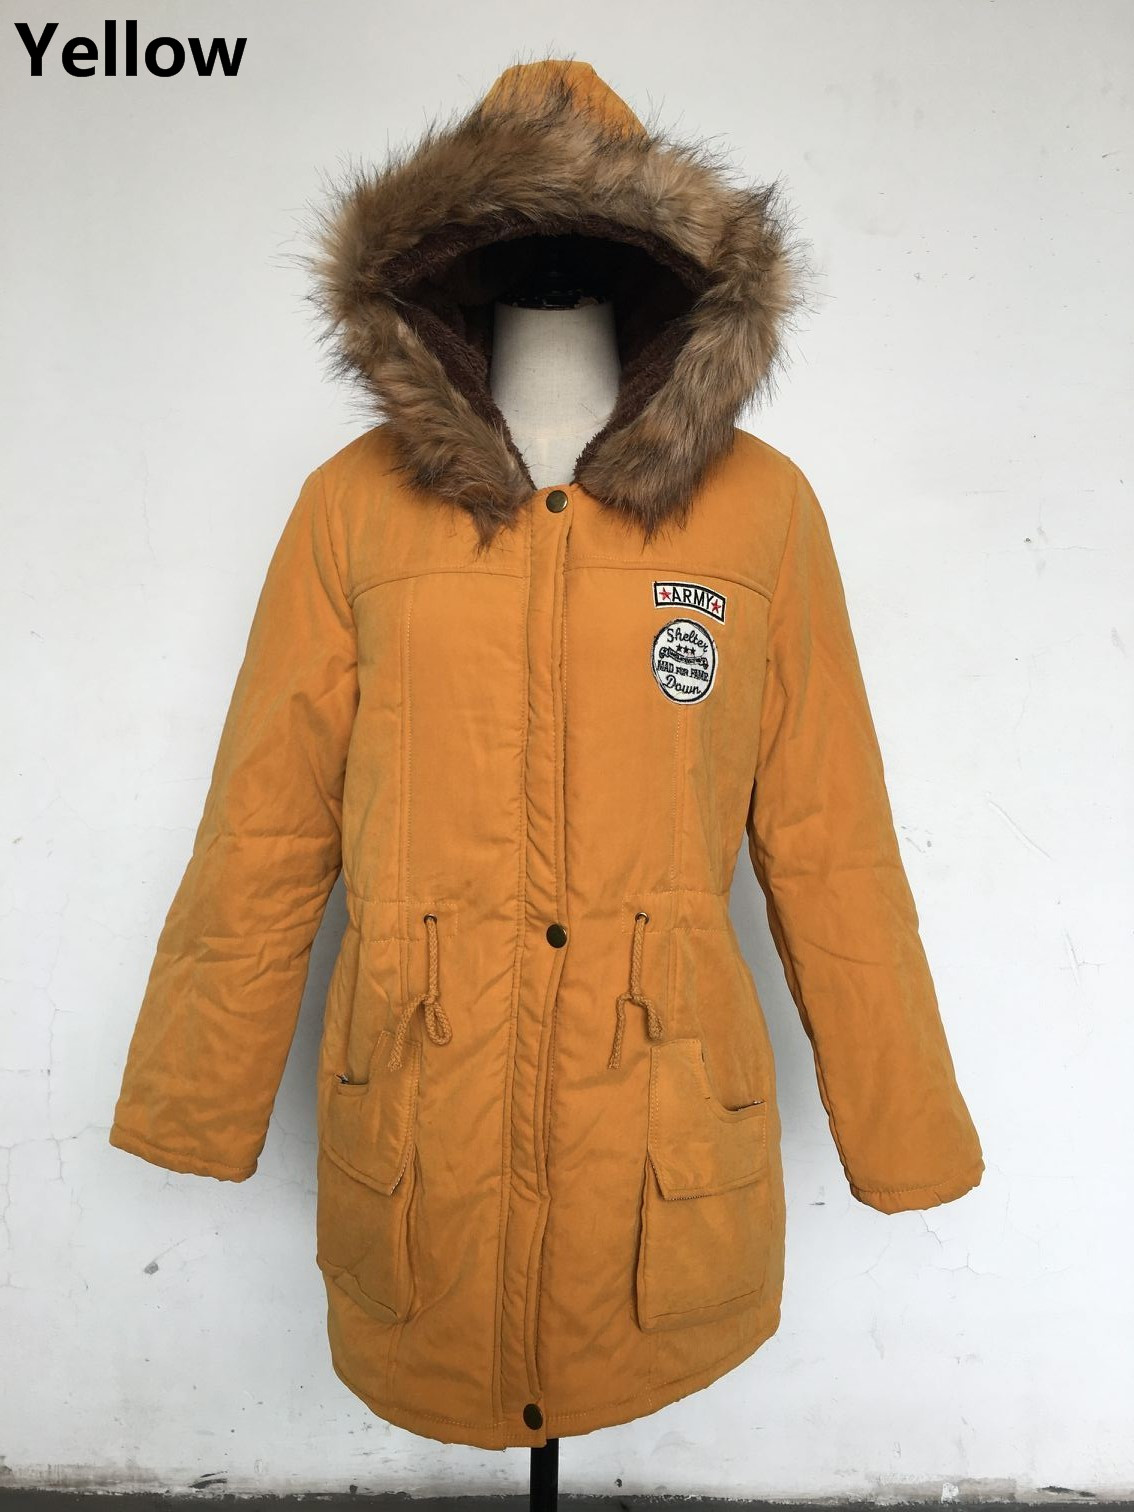 HTB15cnTgcyYBuNkSnfoq6AWgVXaG Women Parka Fashion Autumn Winter Warm Jackets Women Fur Collar Coats Long Parkas Hoodies Office Lady Cotton Plus Size